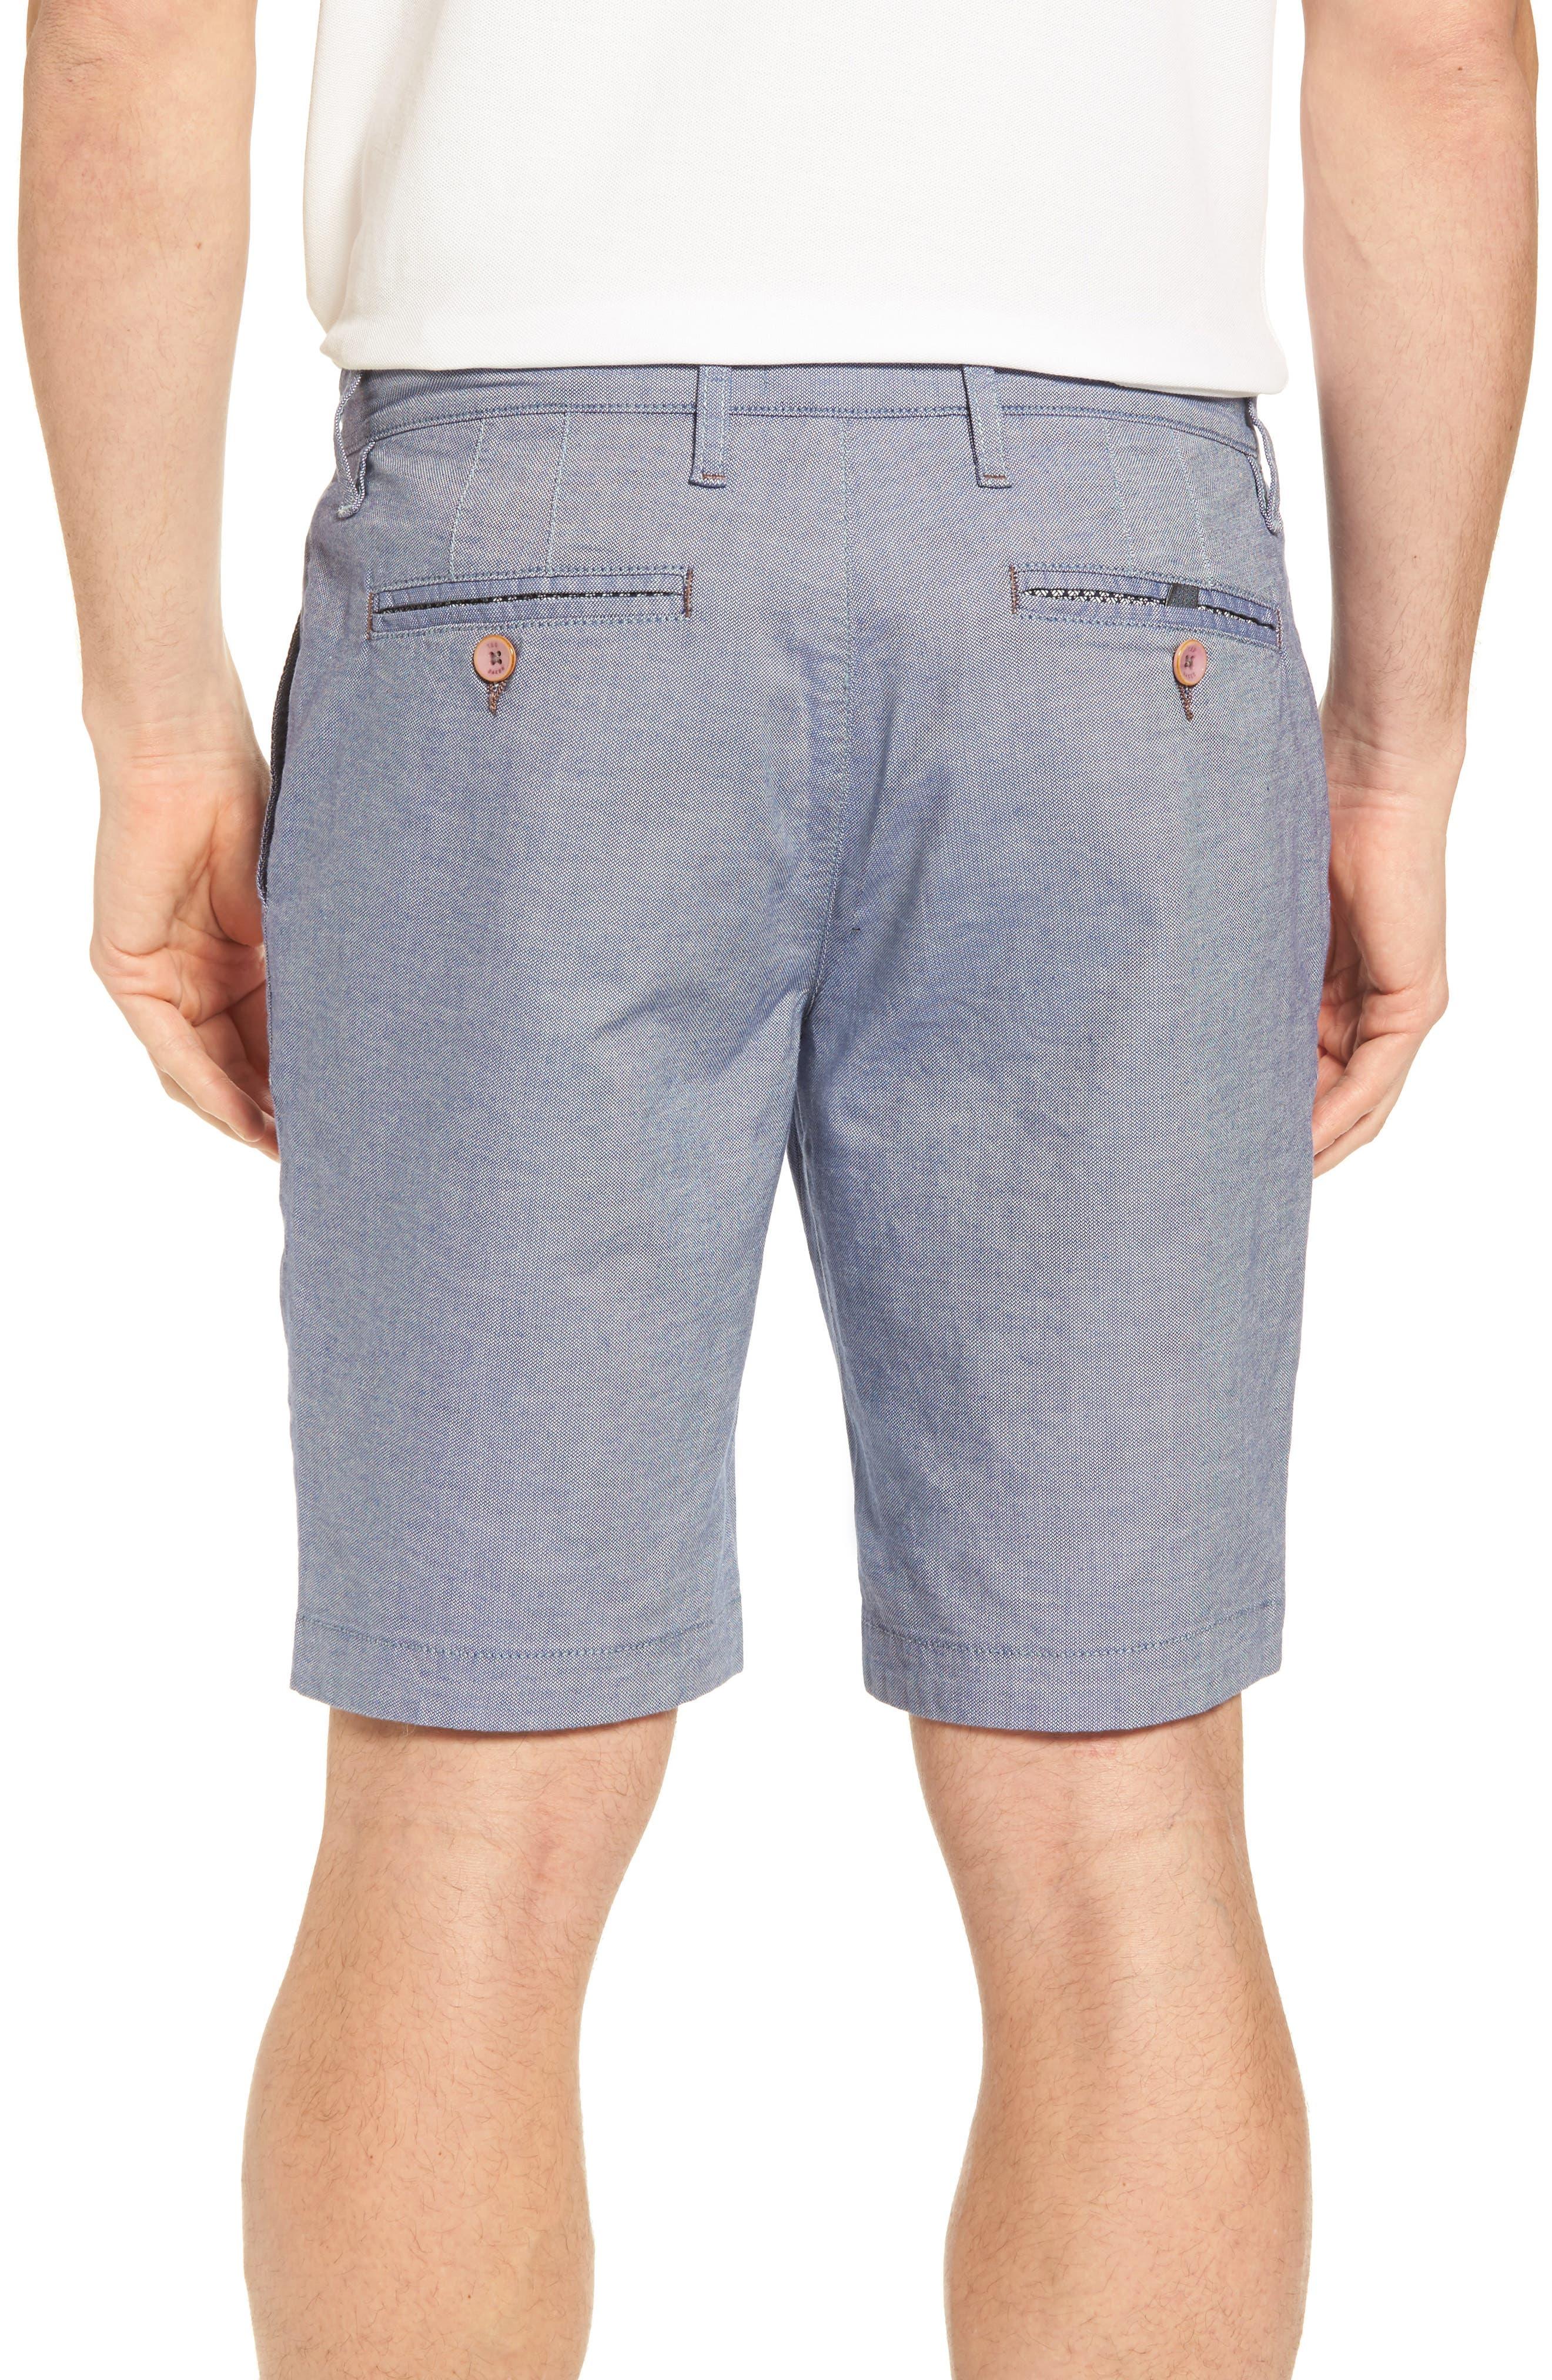 Herbosh Shorts,                             Alternate thumbnail 2, color,                             Navy